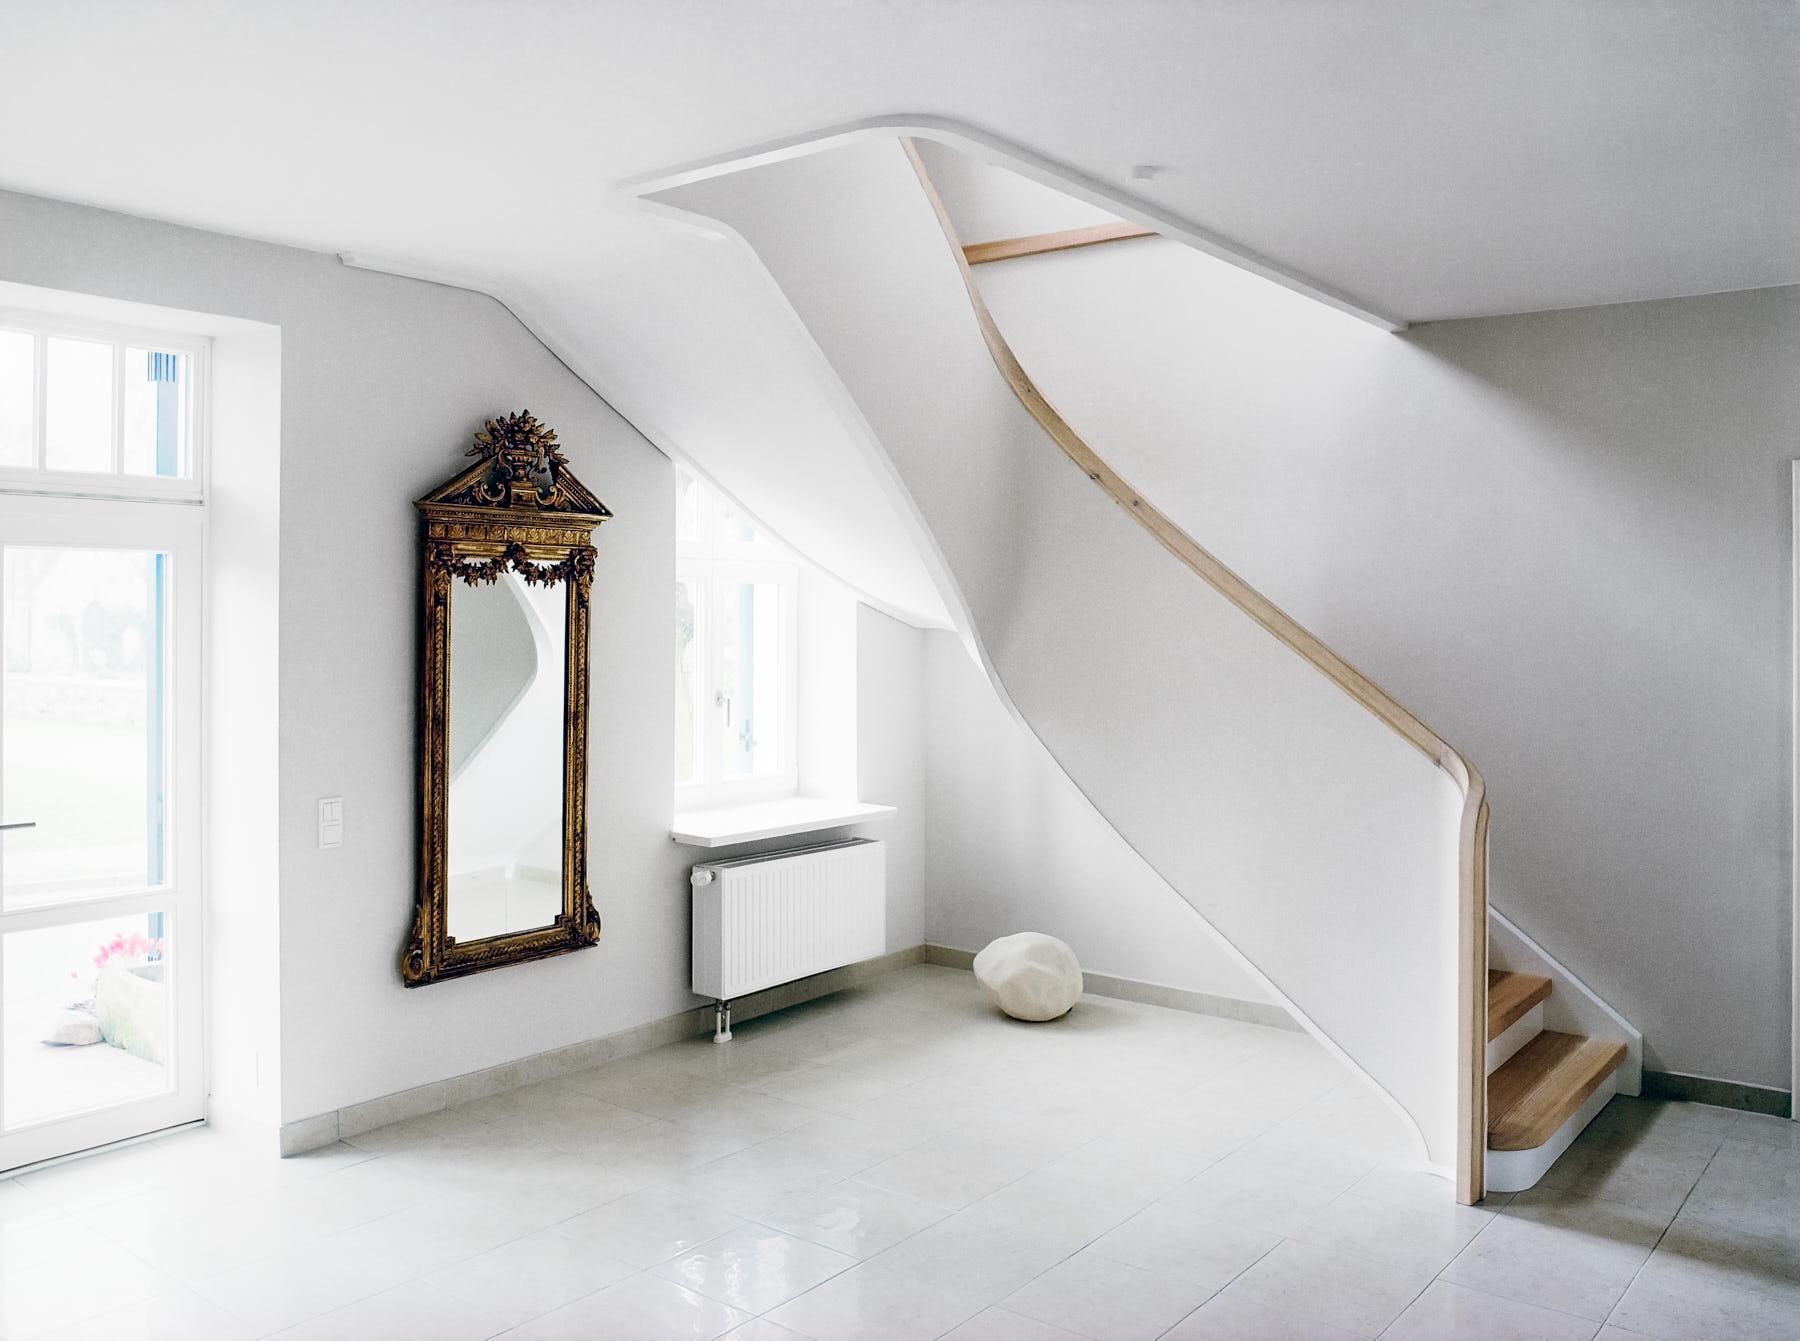 weisse treppe wei e treppe mit trittstufen aus l rchenholz daniel beutler. Black Bedroom Furniture Sets. Home Design Ideas